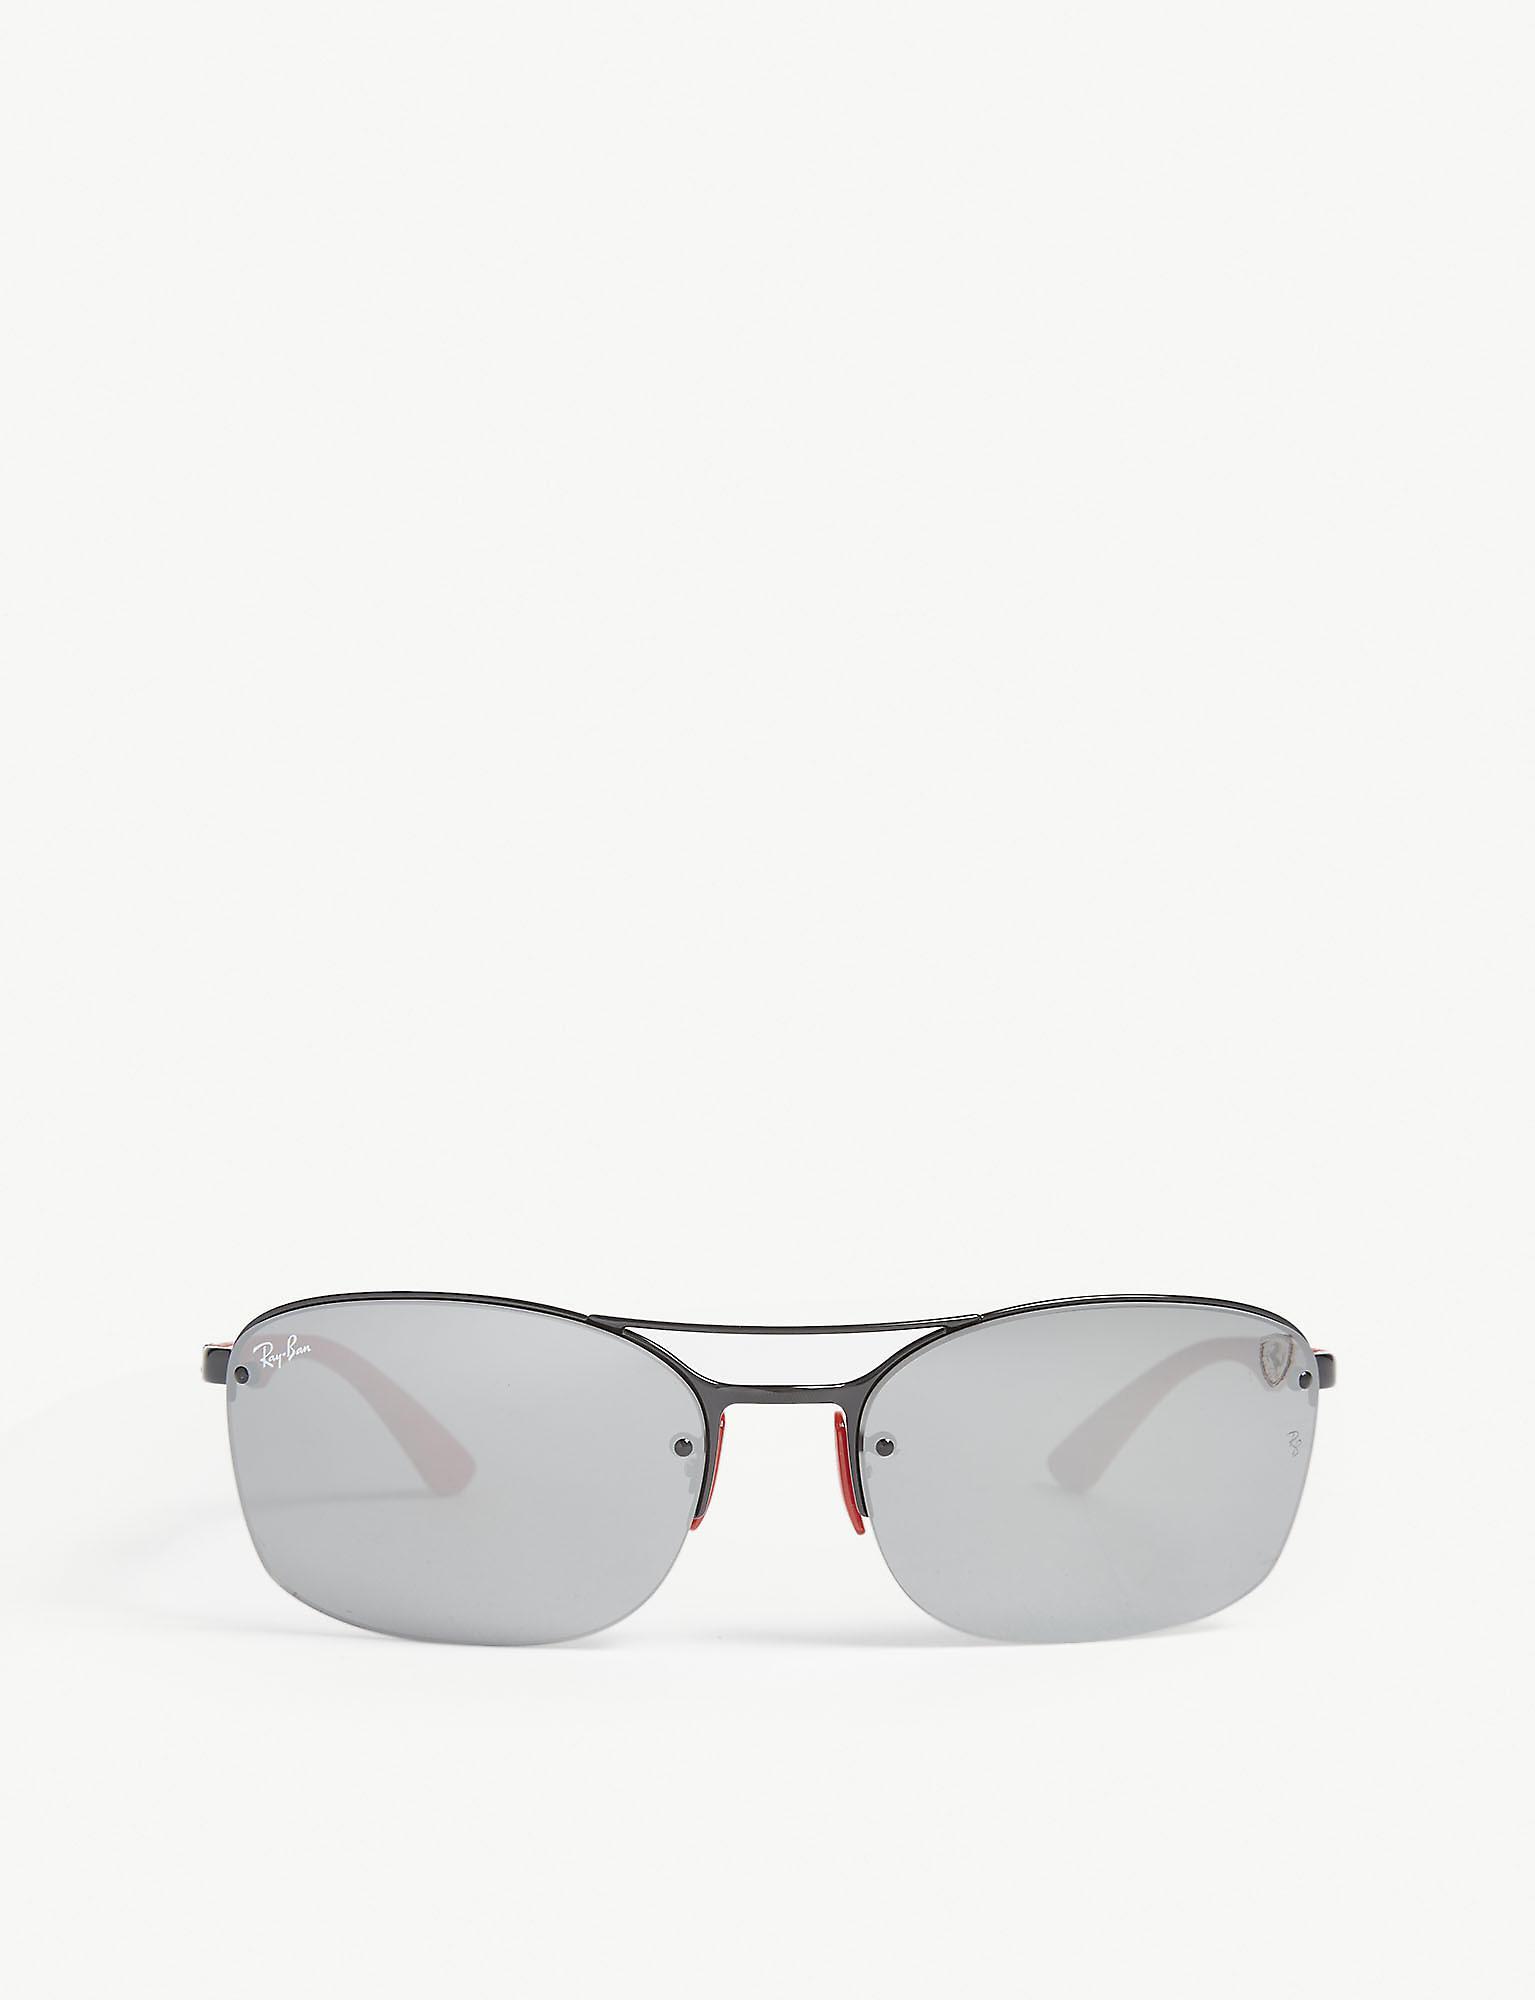 9f8f2b5db1 Ray-Ban Rb3617 Scuderia Ferrari Rectangle-frame Sunglasses in Black ...